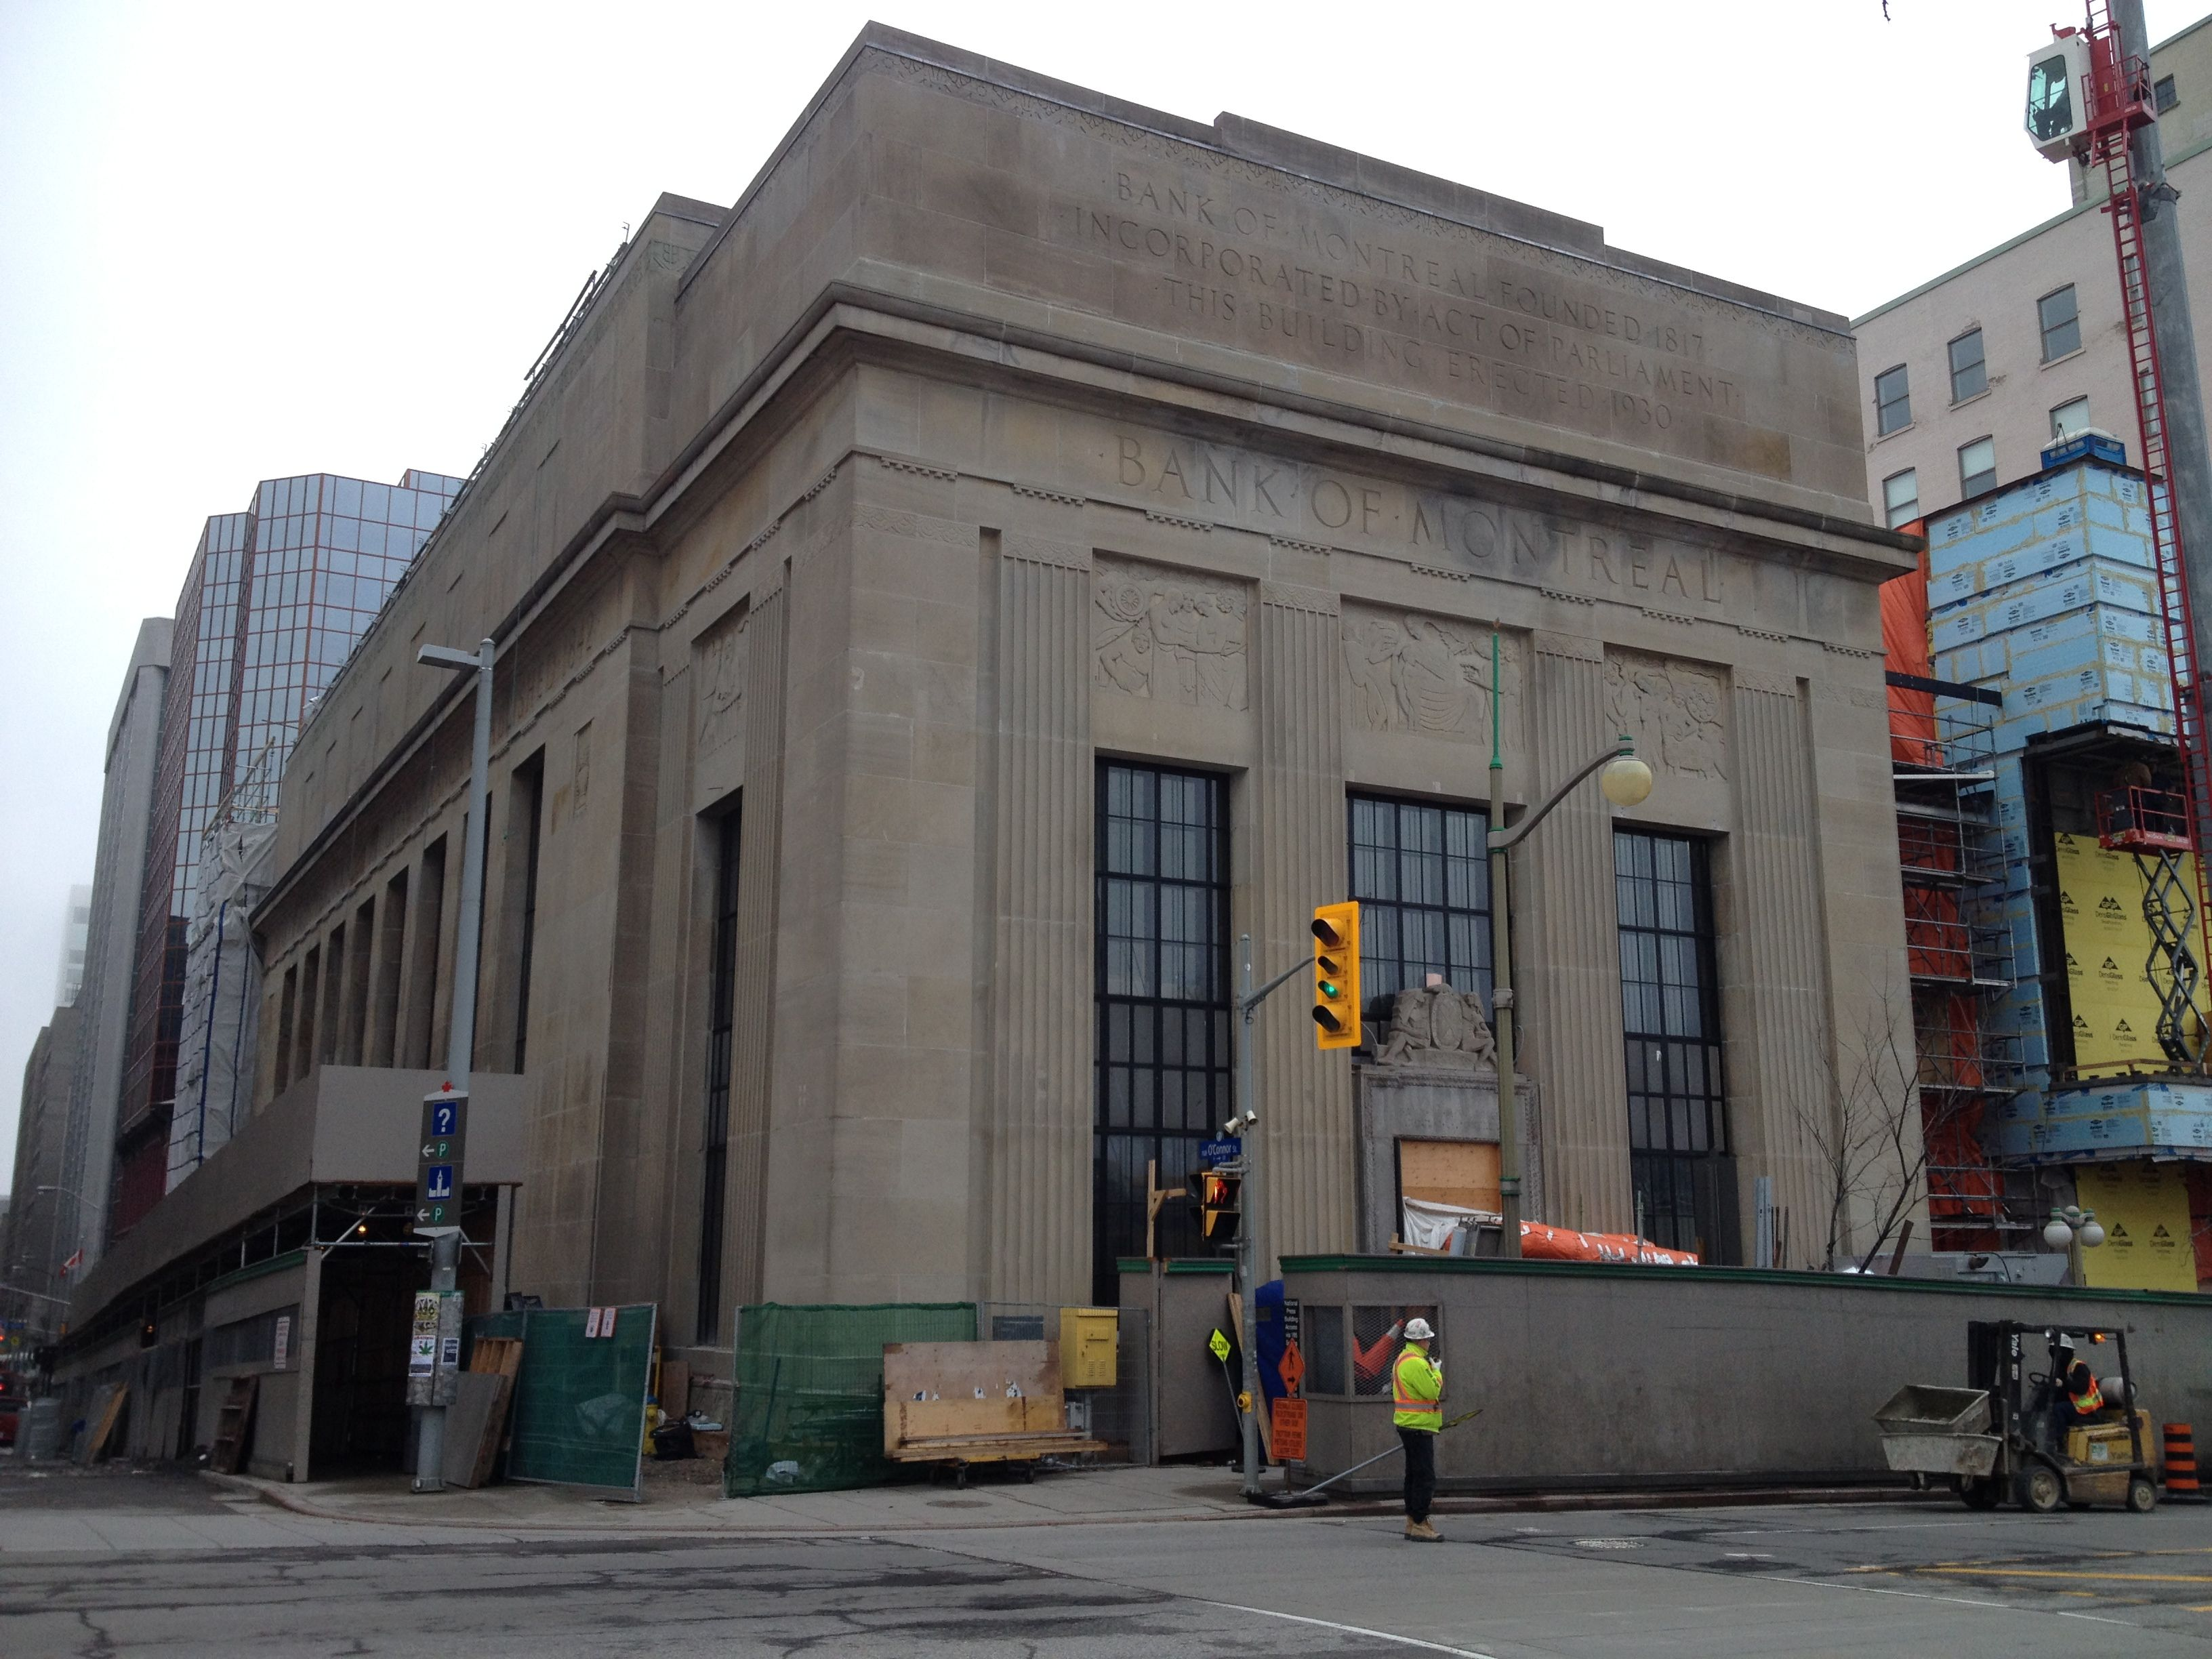 Art Deco Hoekbank.More Downtown Ottawa Art Deco Natalie Servant Designs